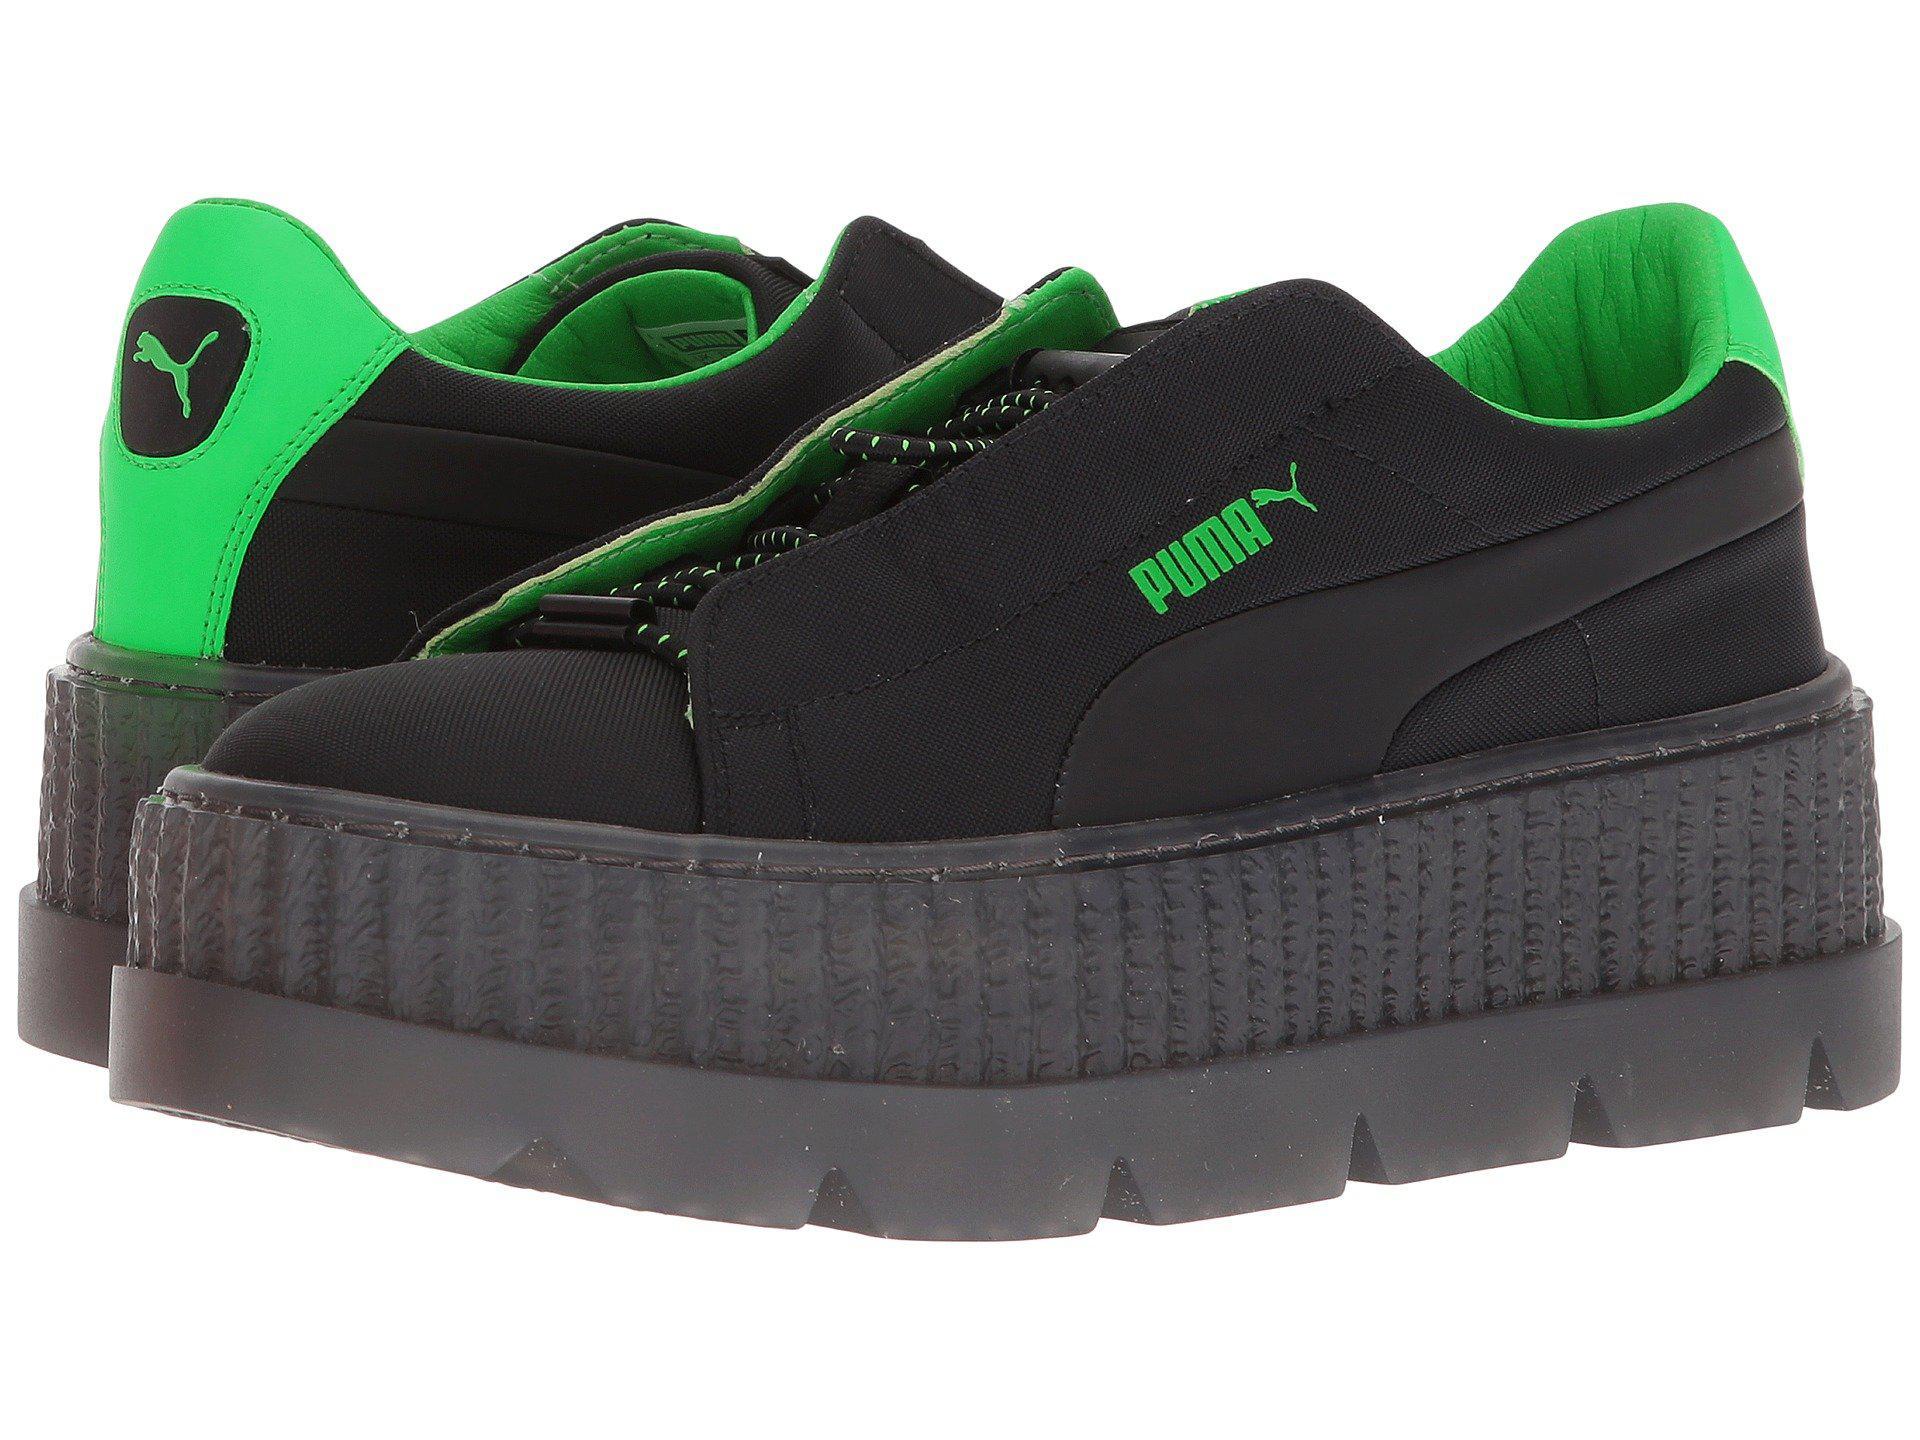 e0d36e93851e18 Lyst - Puma X Fenty By Rihanna Cleated Creeper Surf ( Black green ...